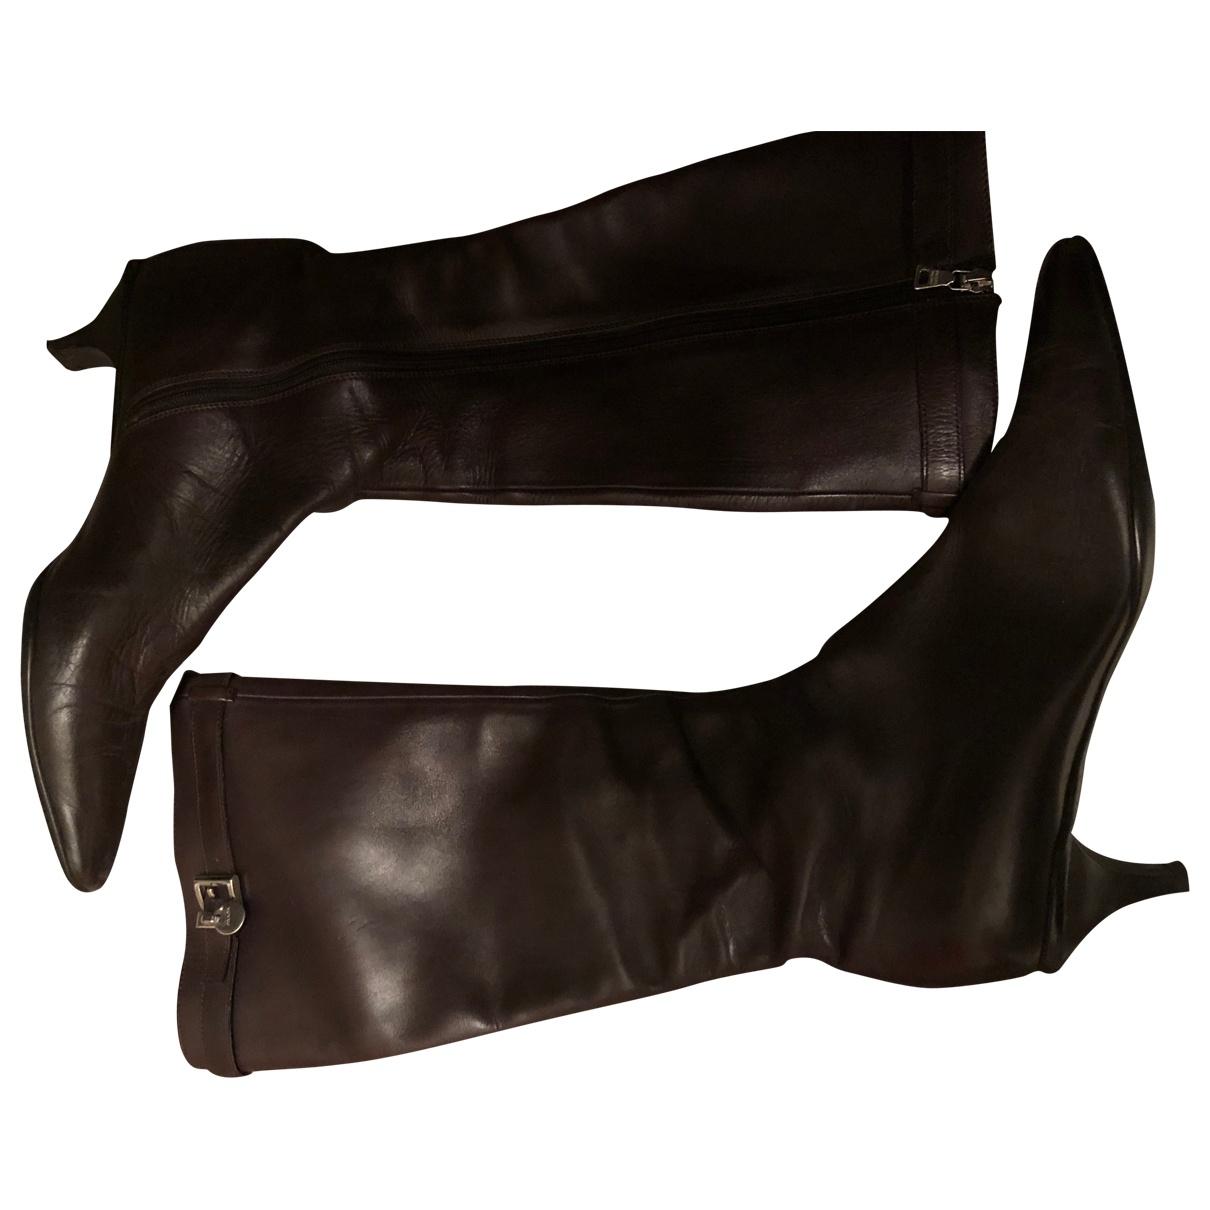 Prada \N Brown Leather Boots for Women 38.5 EU